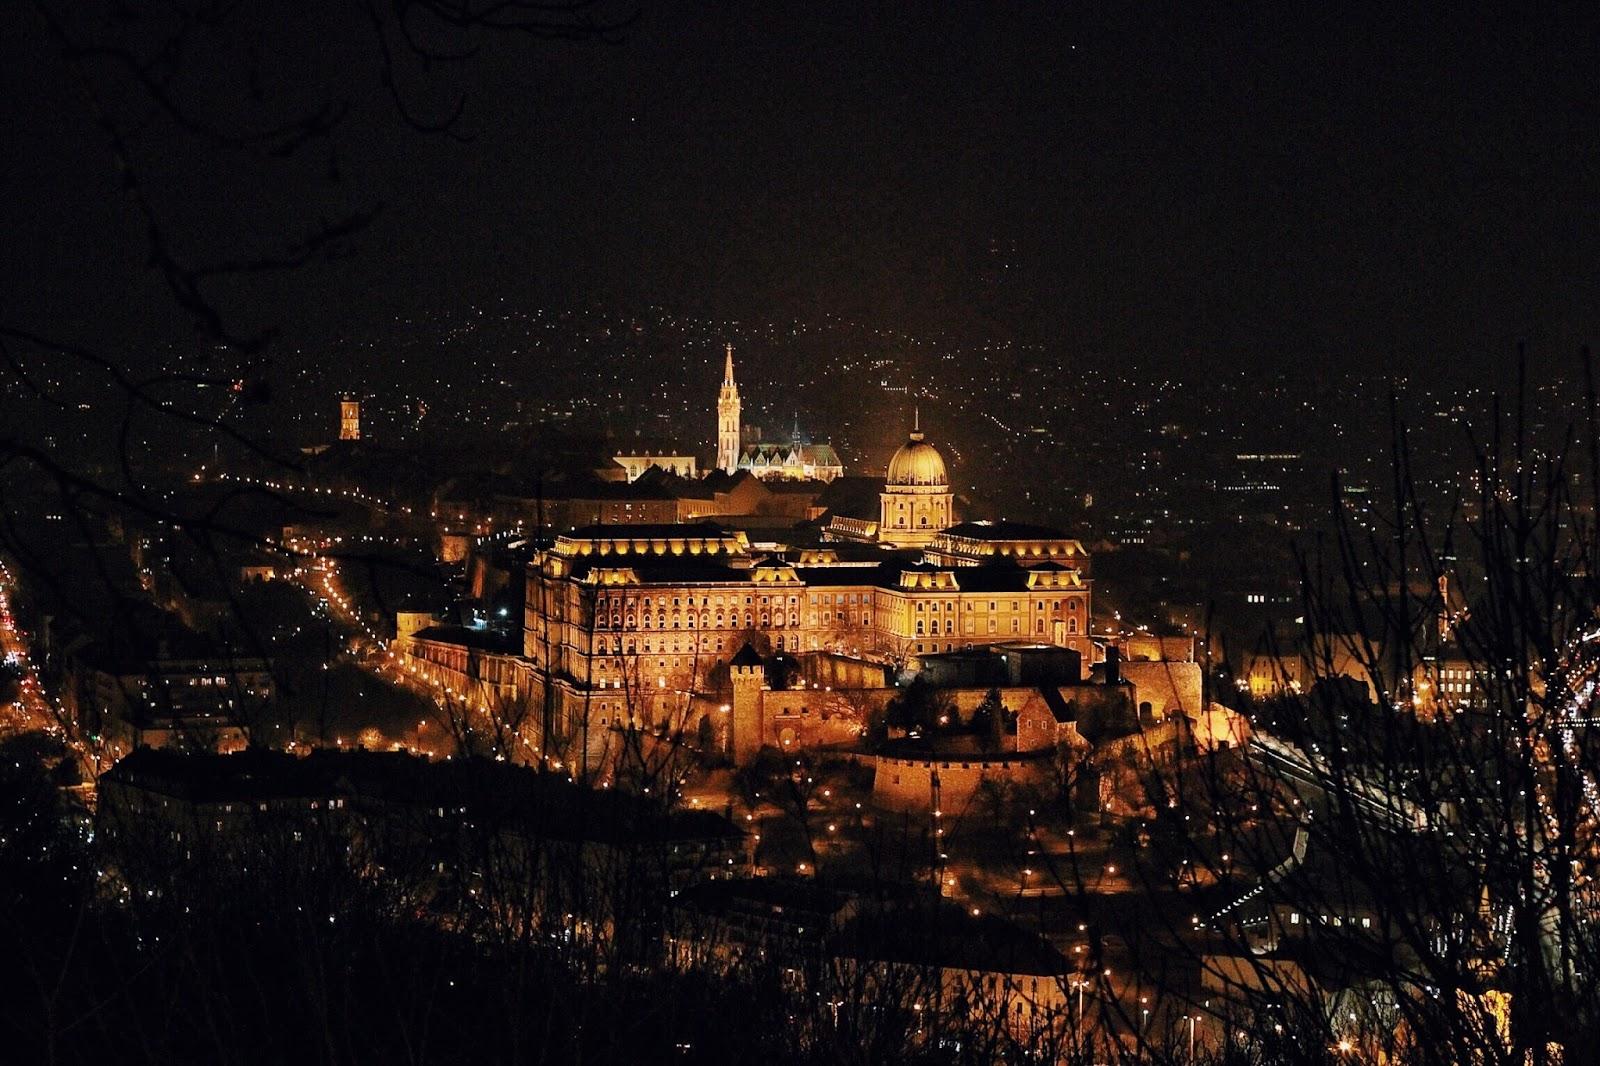 lifesthayle-budapest-citadella-buda-castle-at-night.jpg